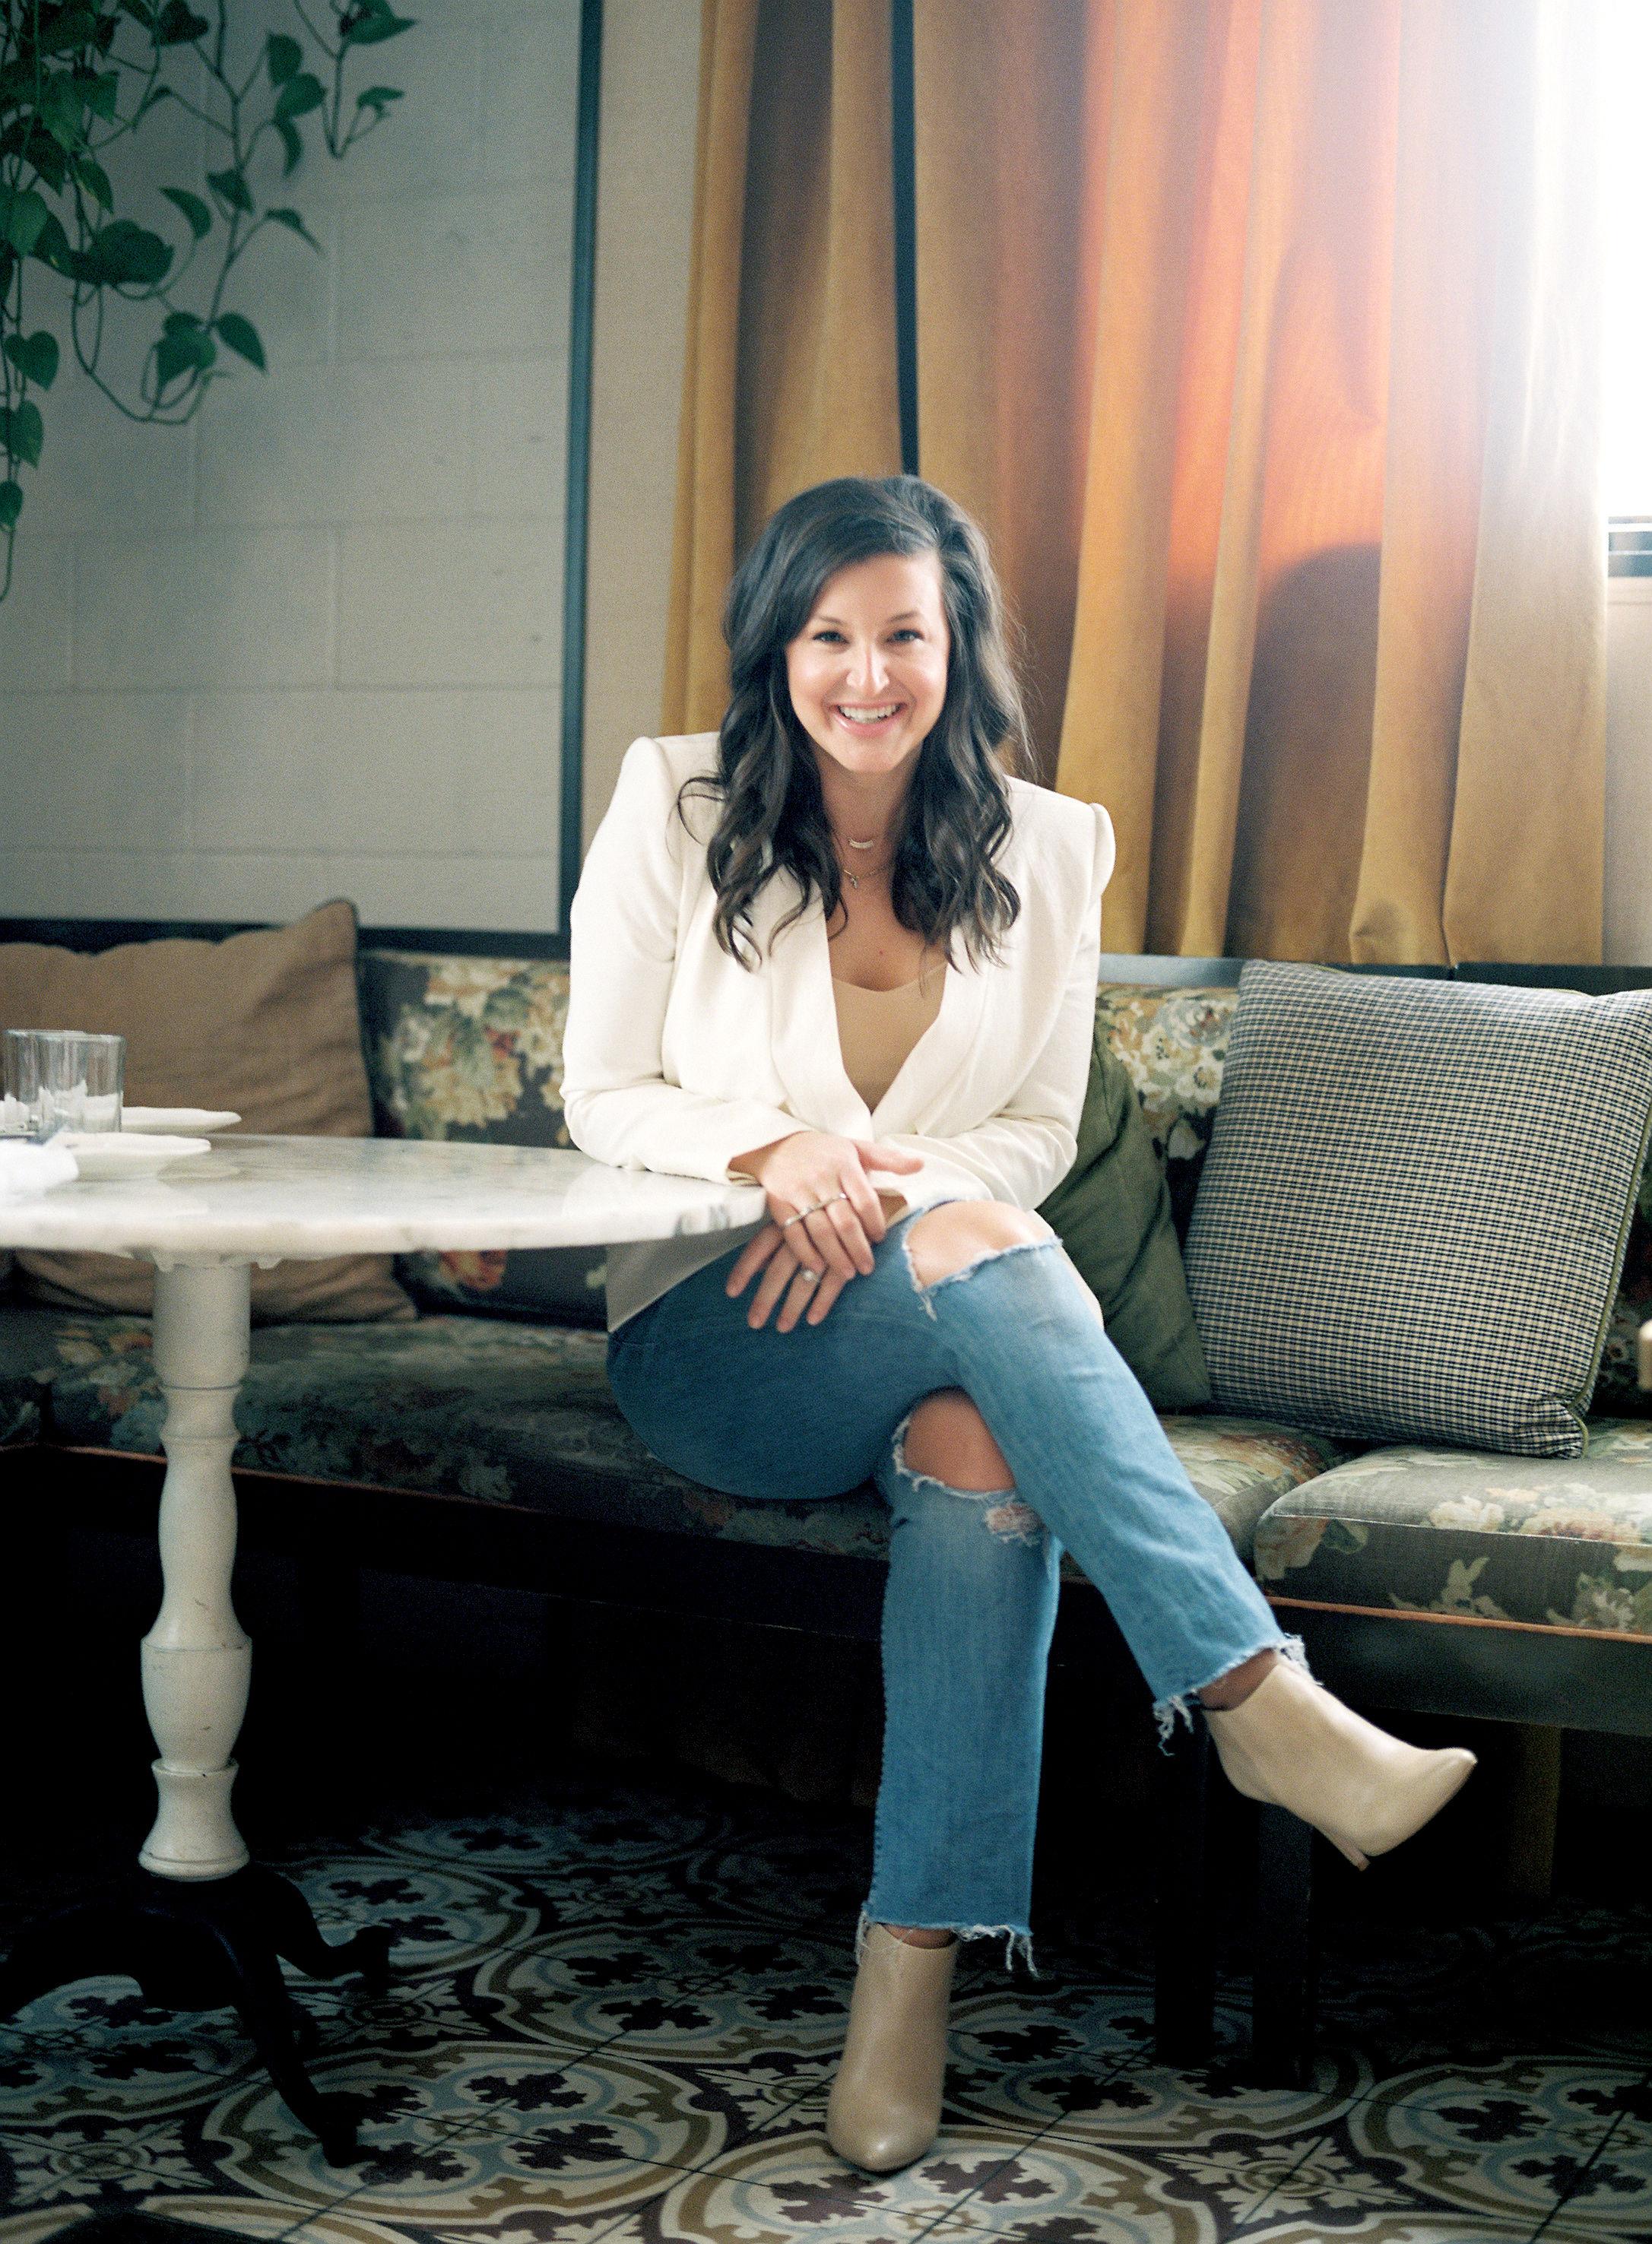 Jessica Zimmerman WE Rule Events Founder community justyna kedra werule global storytelling inc fortune entrepreneurgirlboss business success.jpg